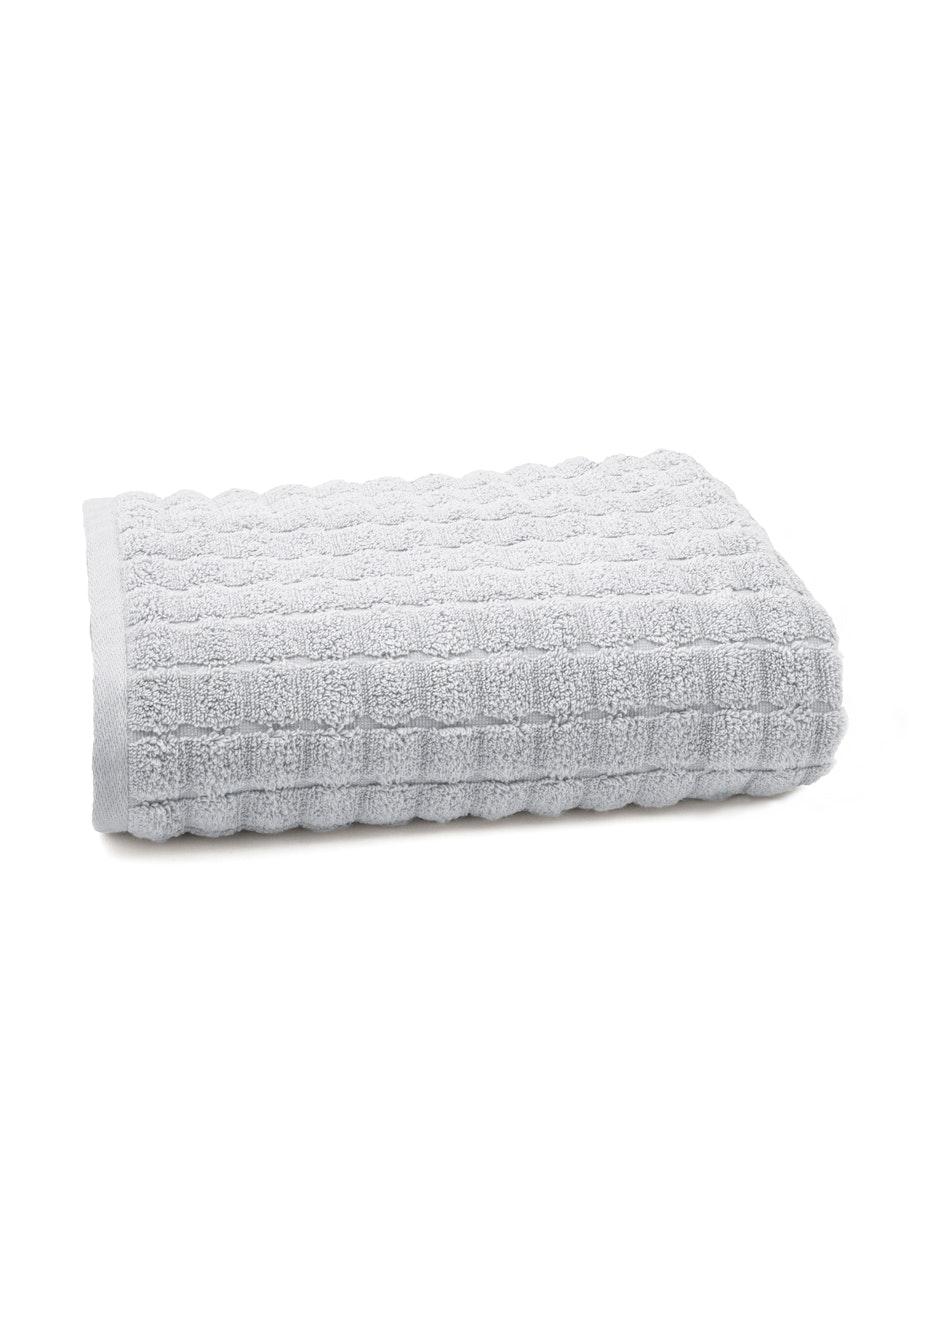 Conran Soho Bath Towel Soft Grey